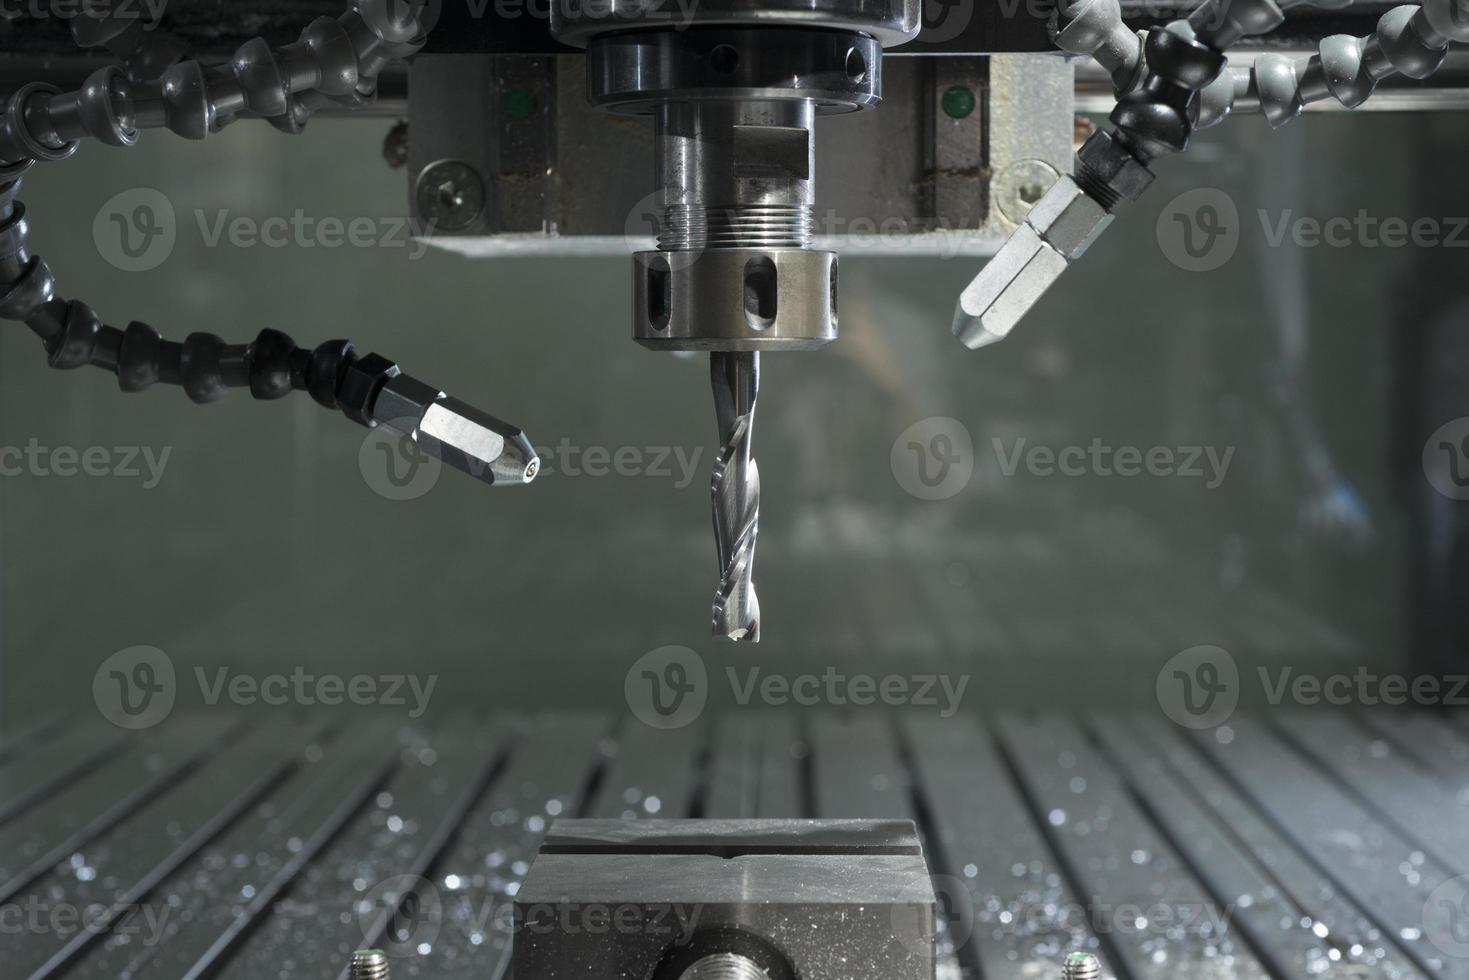 moinho industrial cnc máquina de processamento de metal automatizado foto